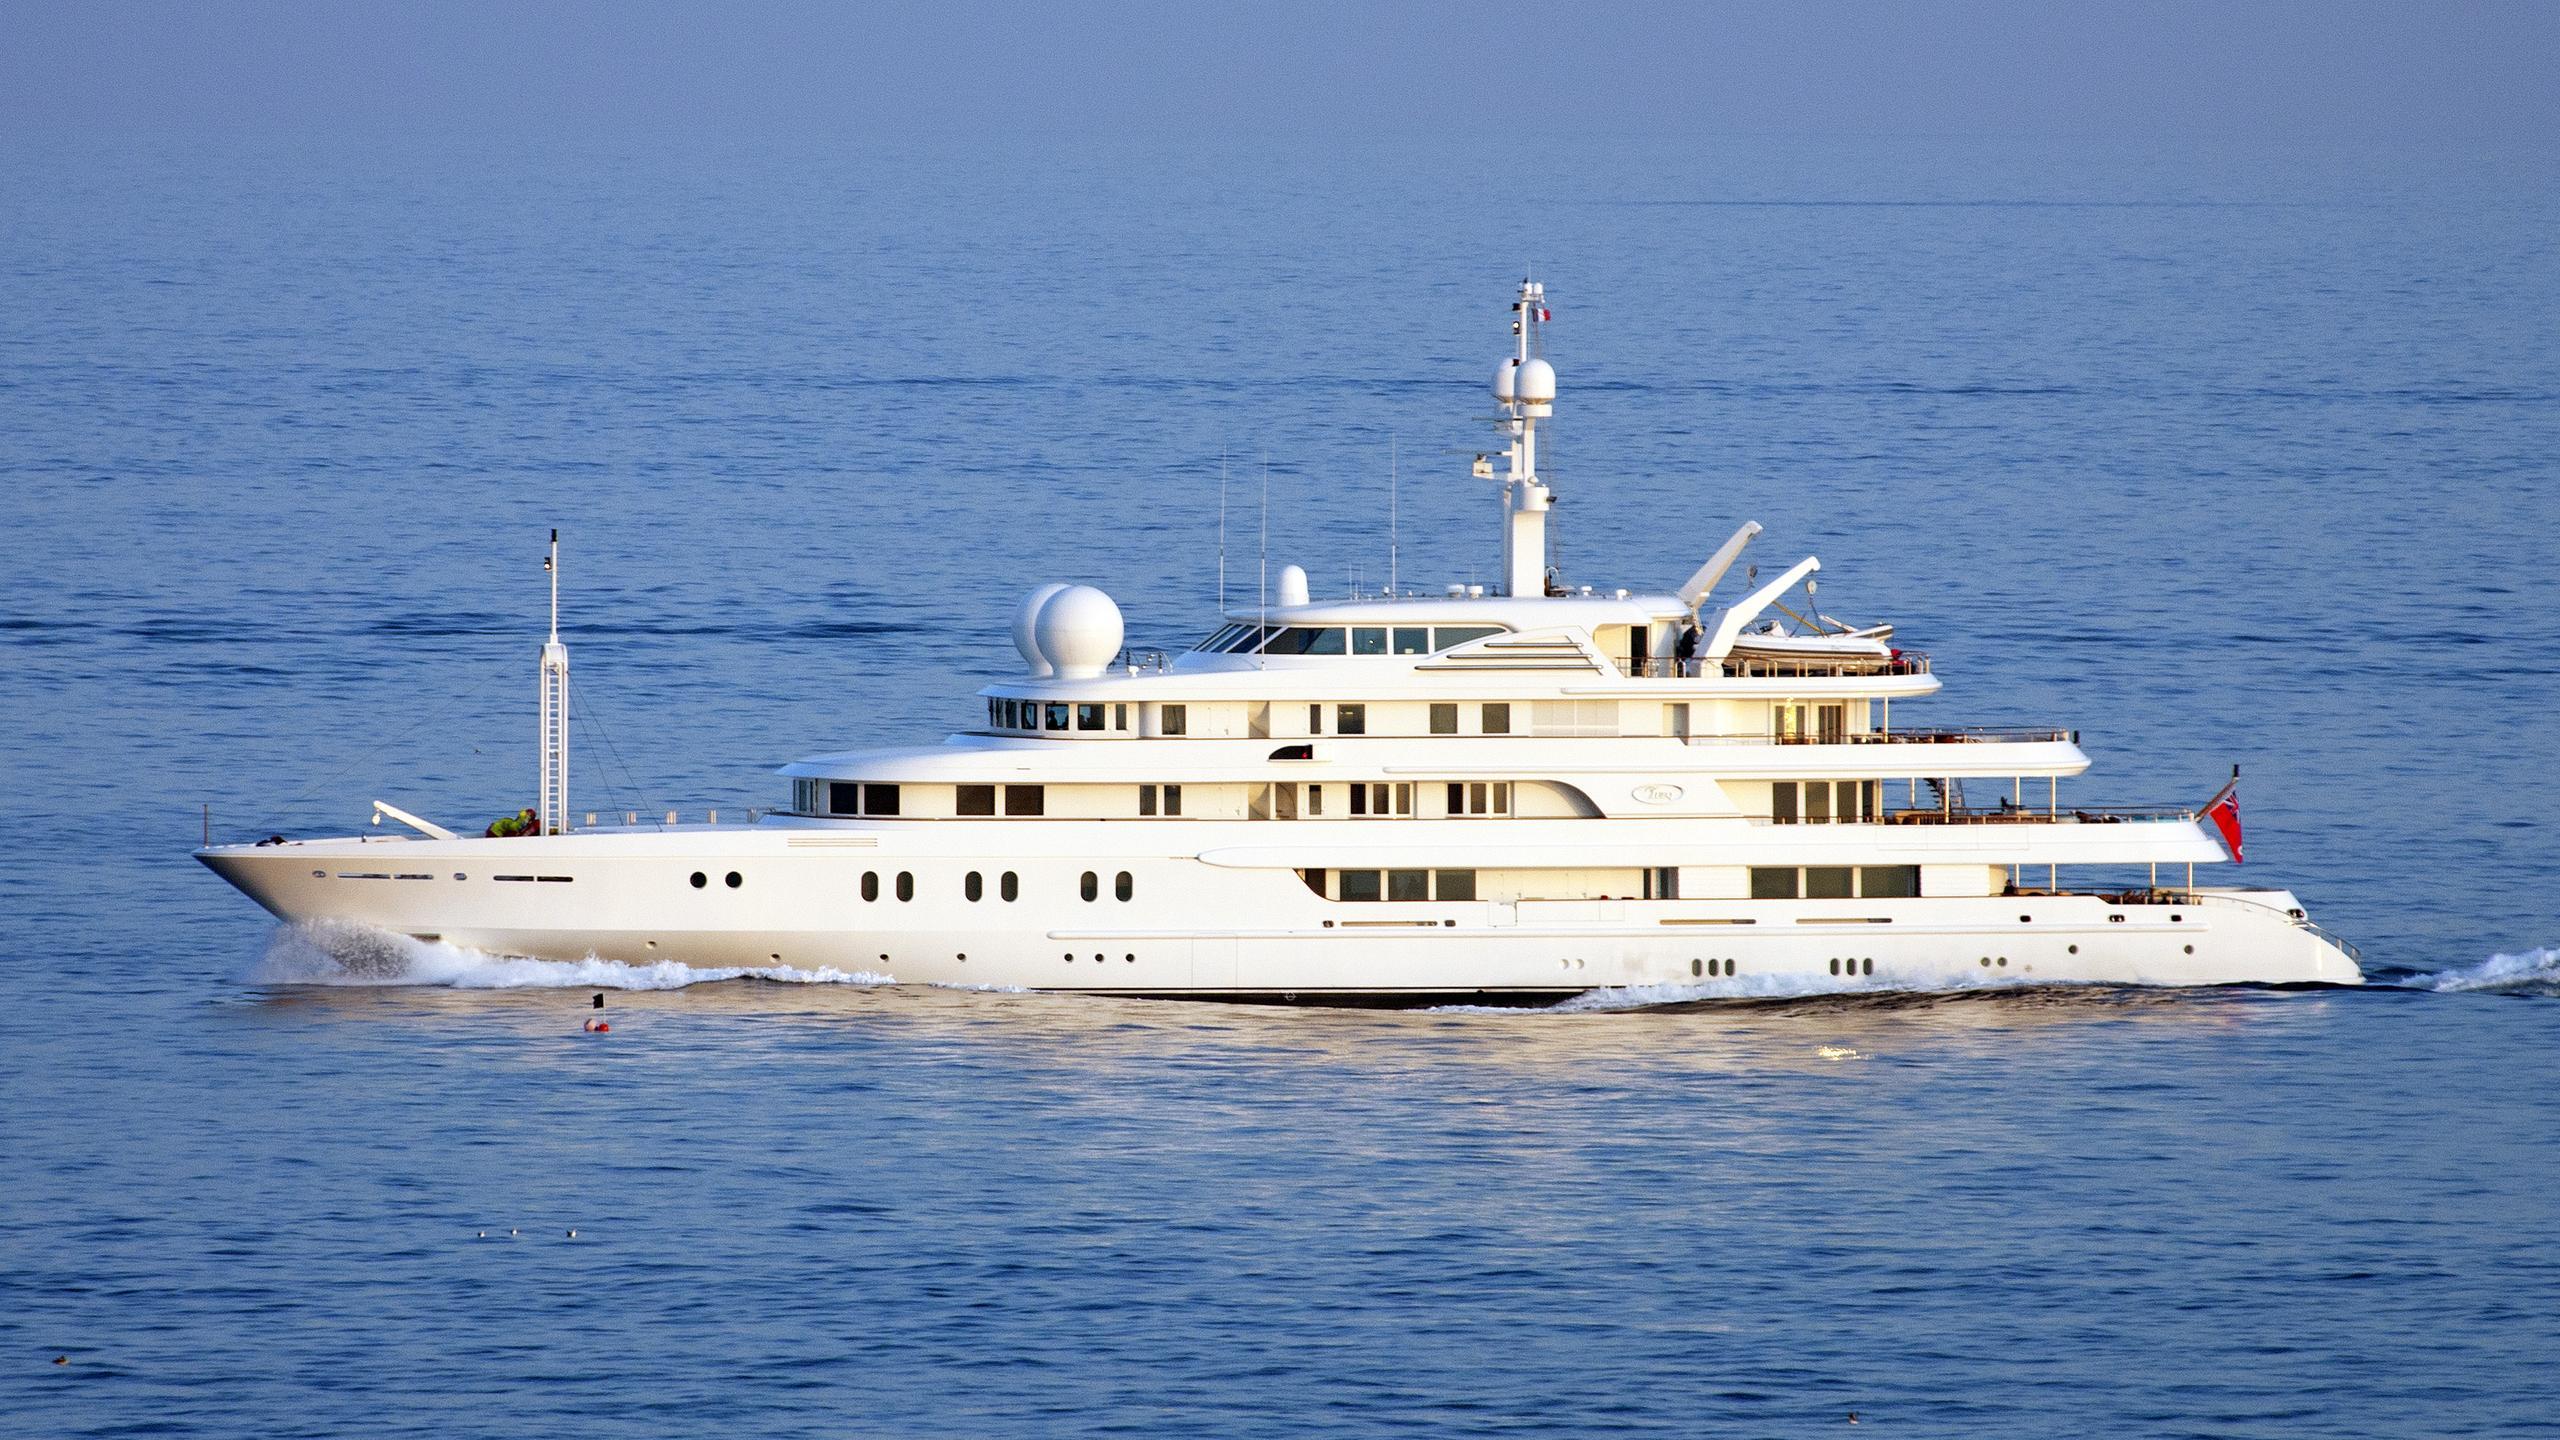 tueq-motor-yacht-Van-Der-Giessen-De-Noord-2002-78m-cruising